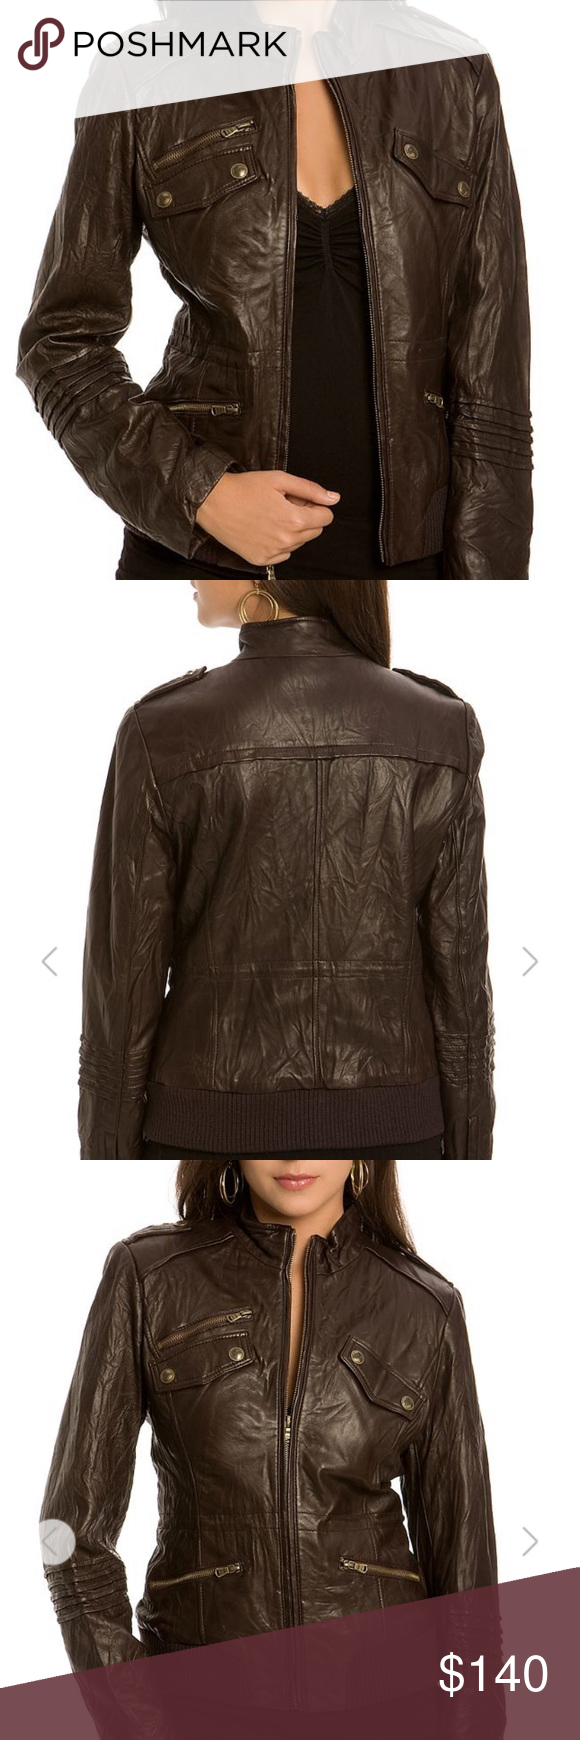 Guess Jocelyn Leather Jacket Brown Brown Leather Jacket Leather Jacket Lit Outfits [ 1740 x 580 Pixel ]